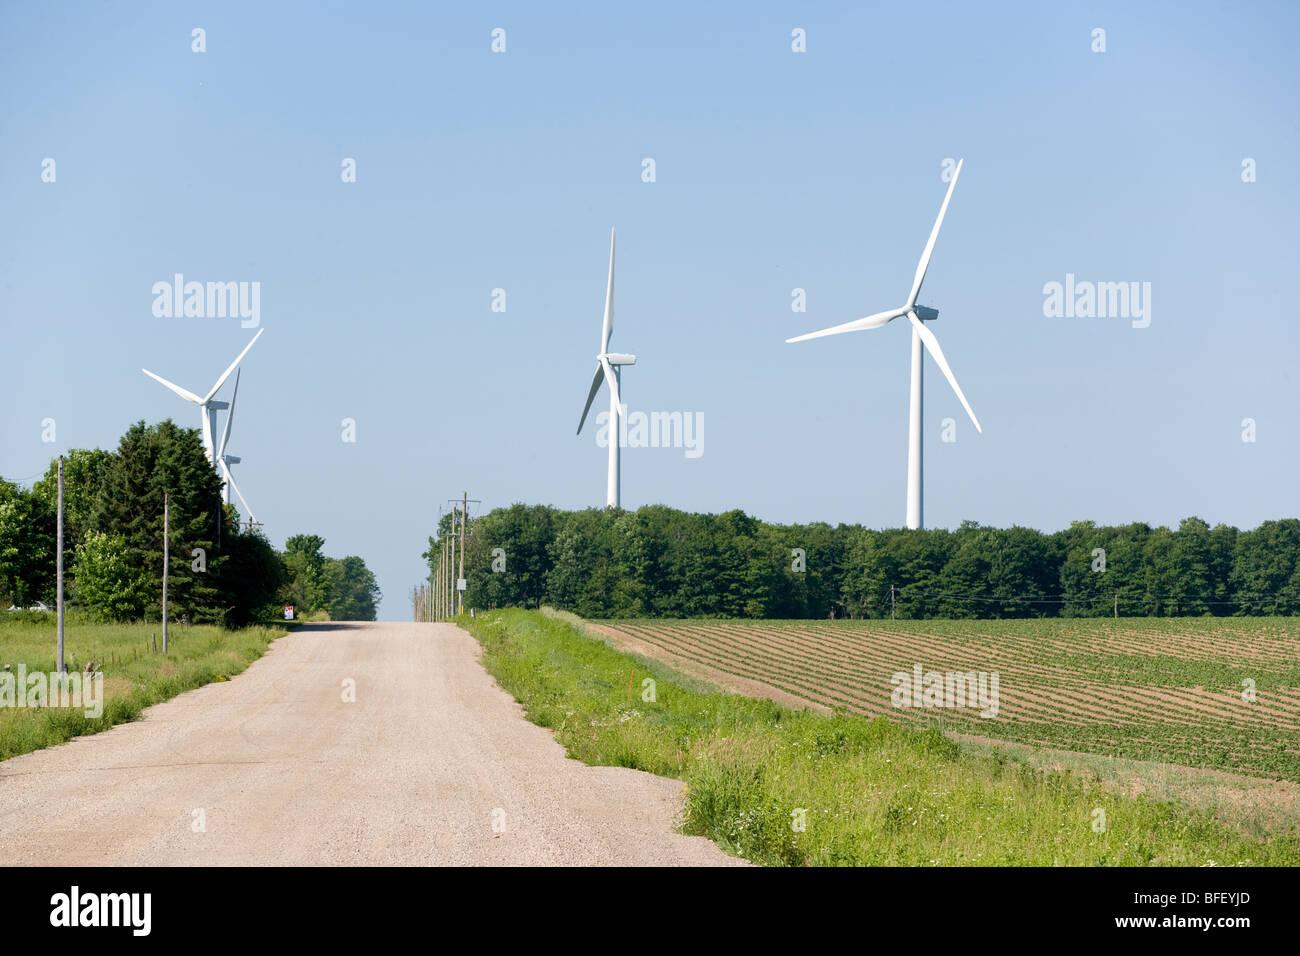 Wind-Turbinen, Shellburne, Ontario, Kanada, Windenergie, Alternative Energie Stockbild